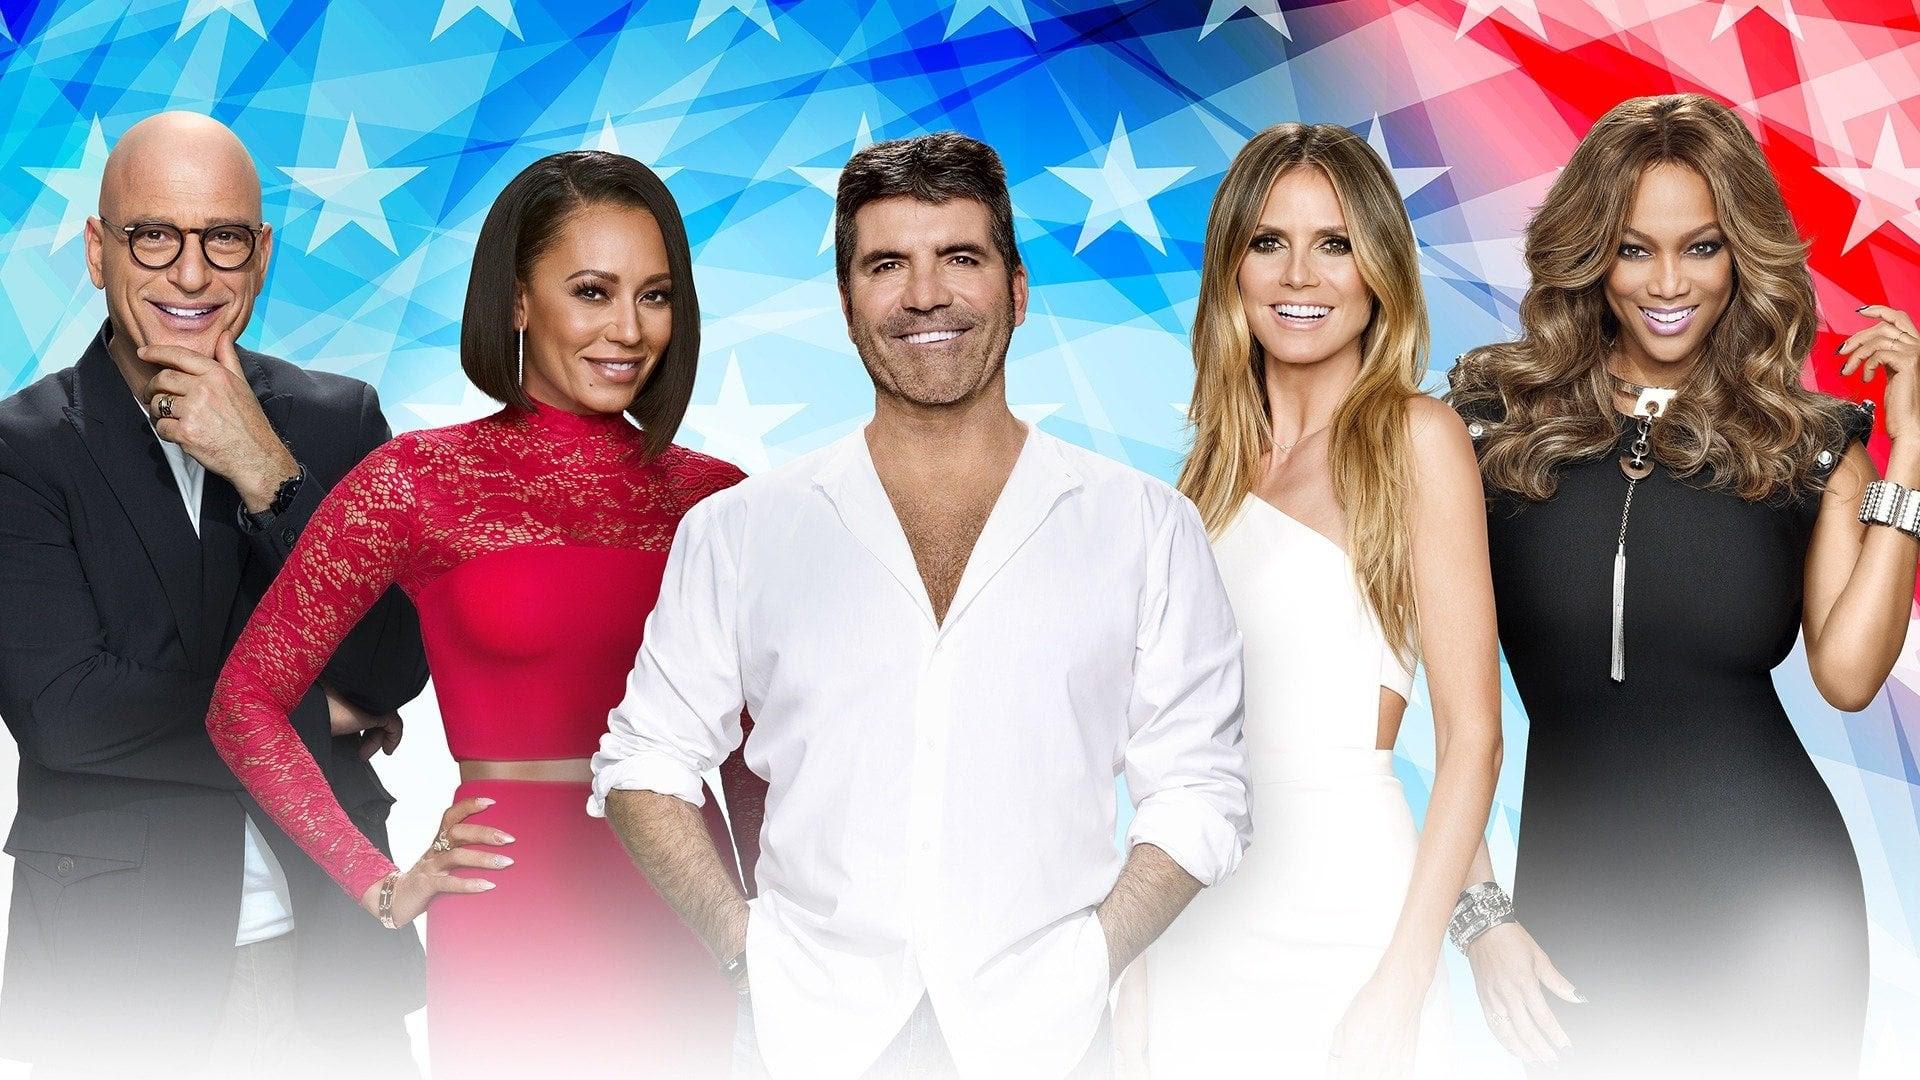 America's Got Talent S16E3